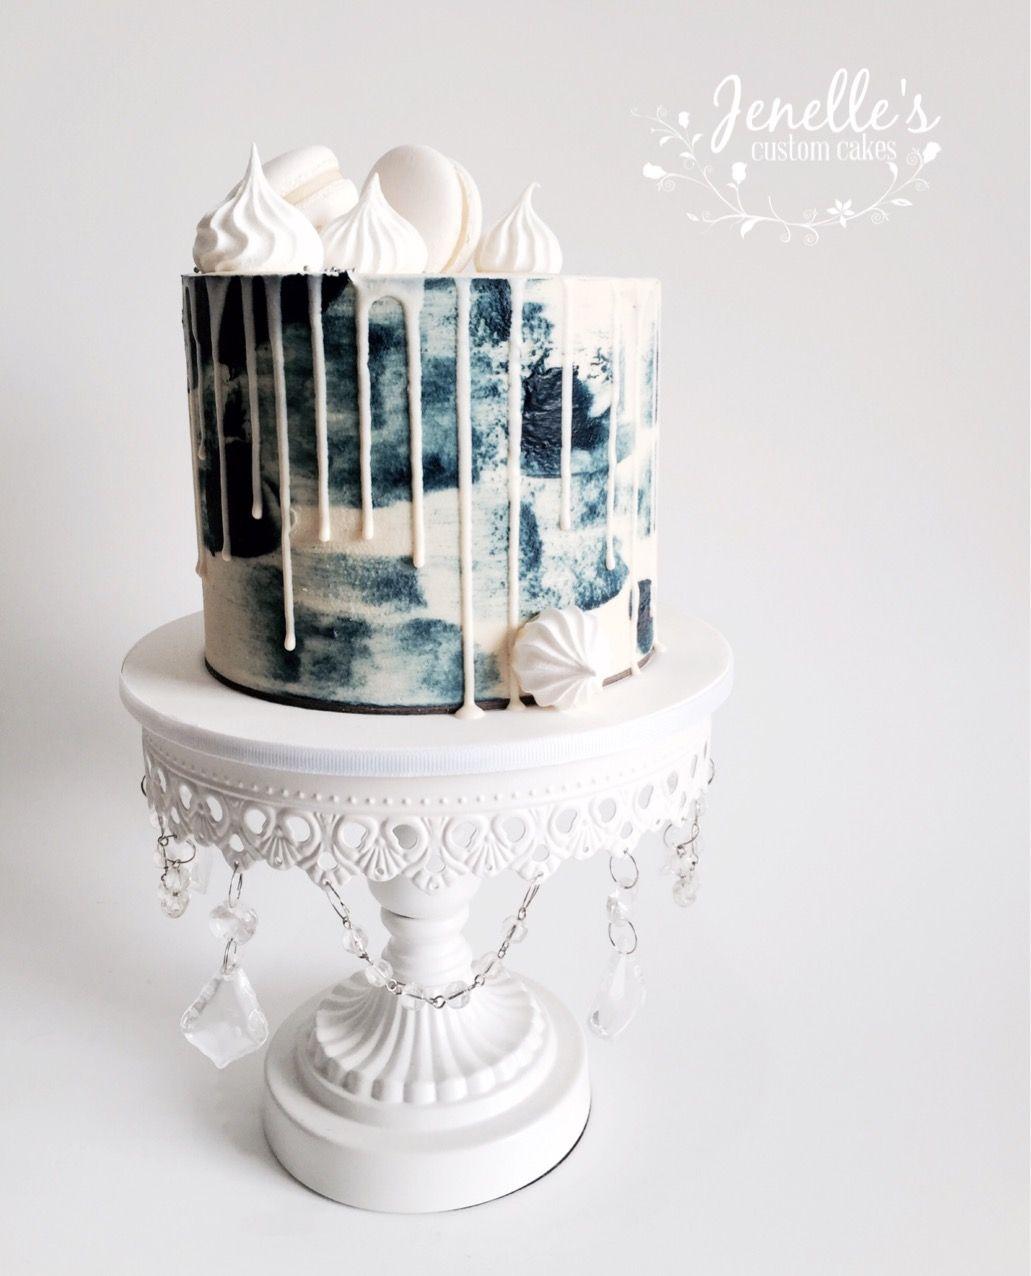 Navy and white drip cake by jenelleus custom cakes Тортики